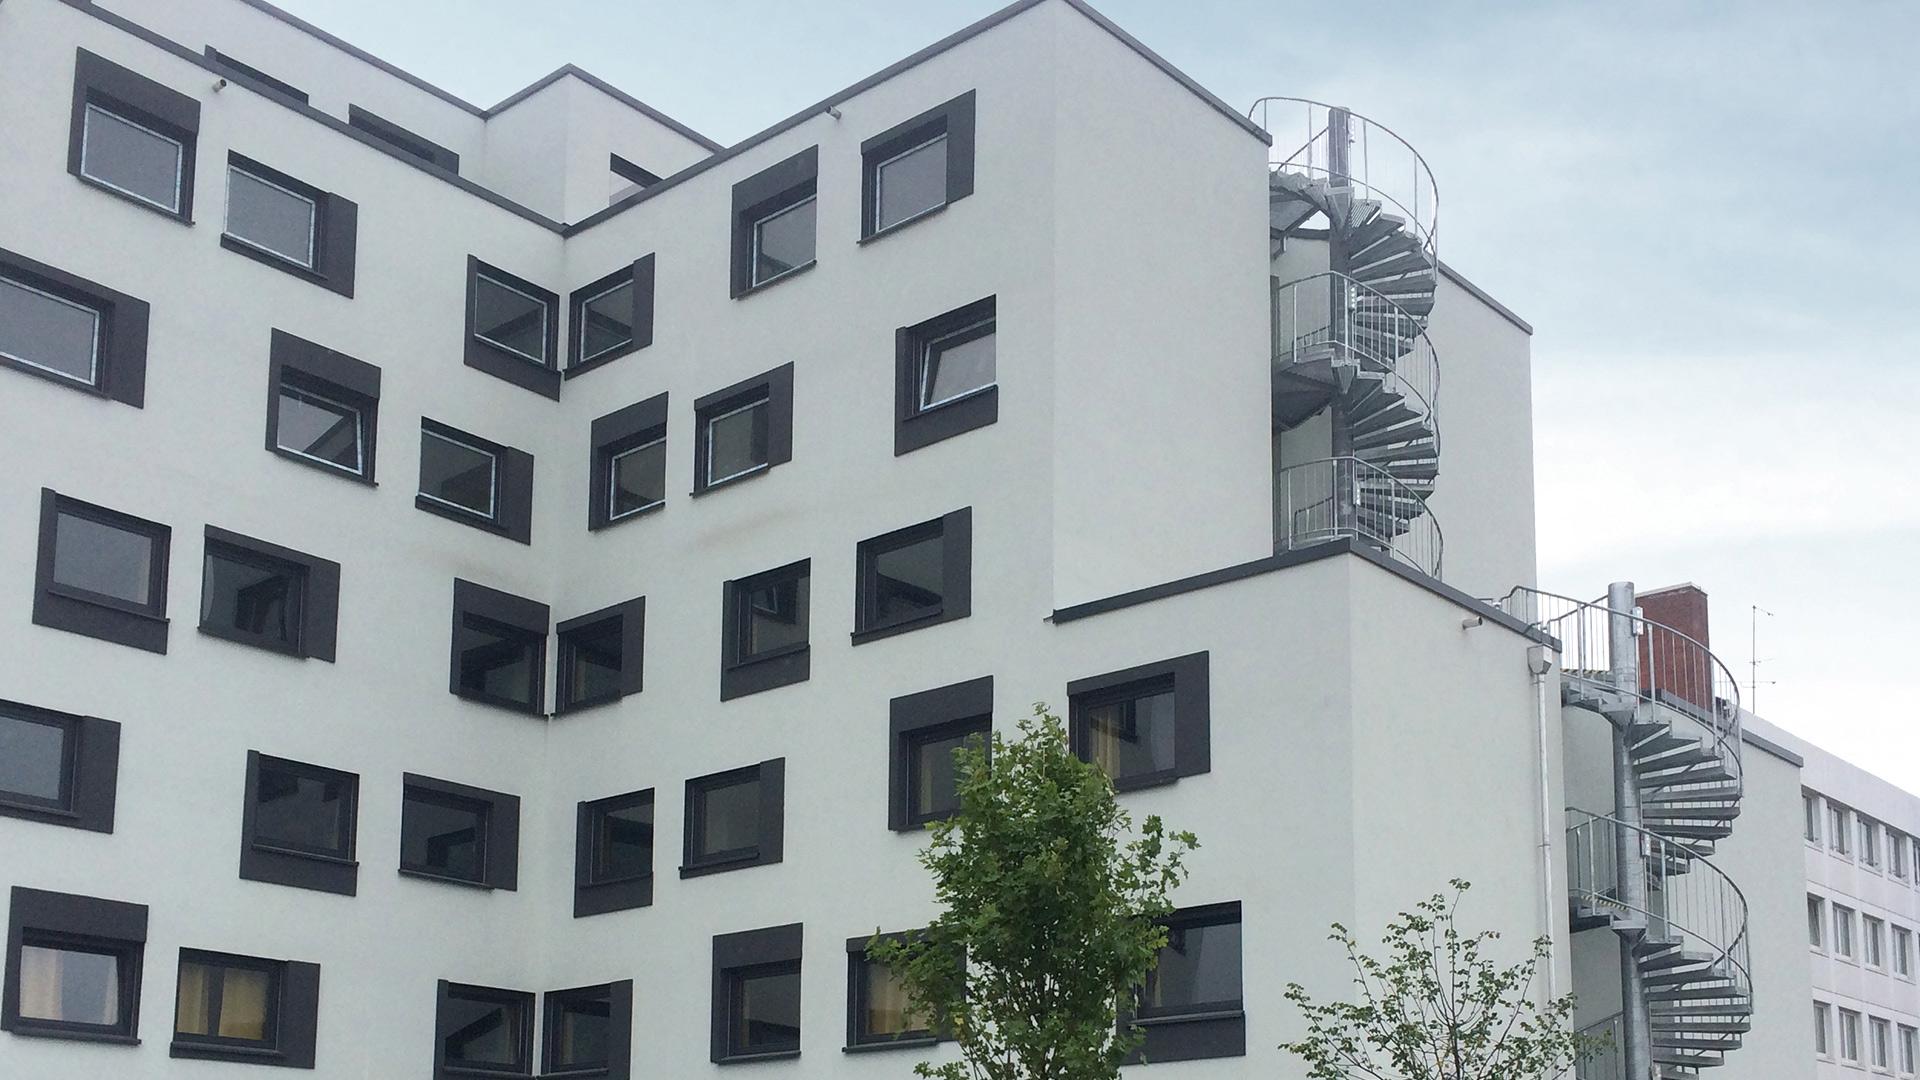 Hôtel B&B, Munich